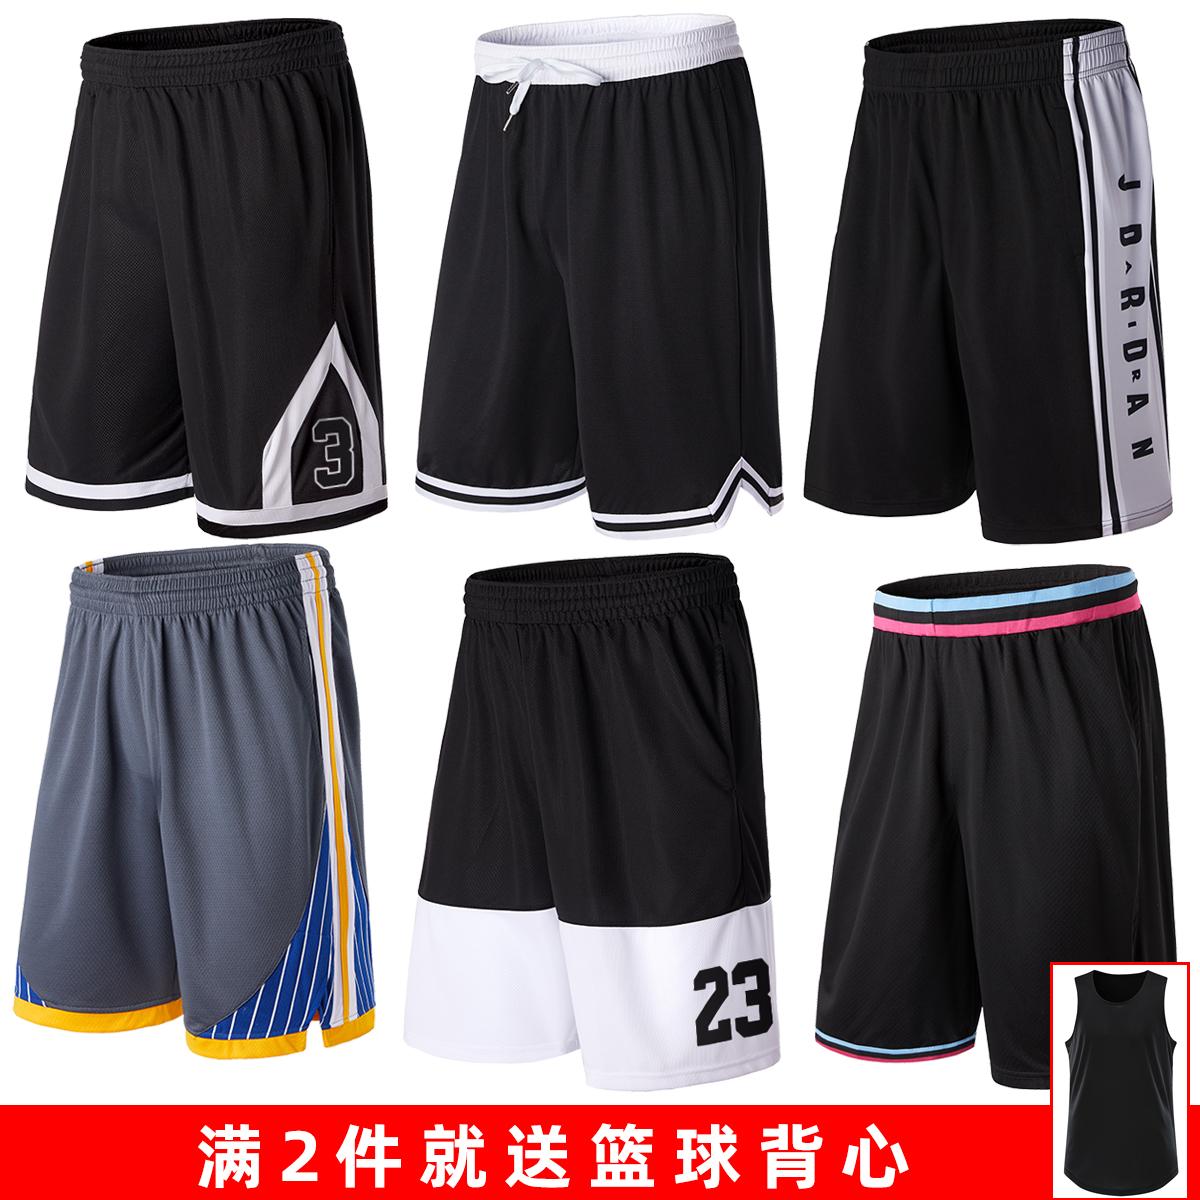 Мужские спортивные штаны / Шорты Артикул 564317558789